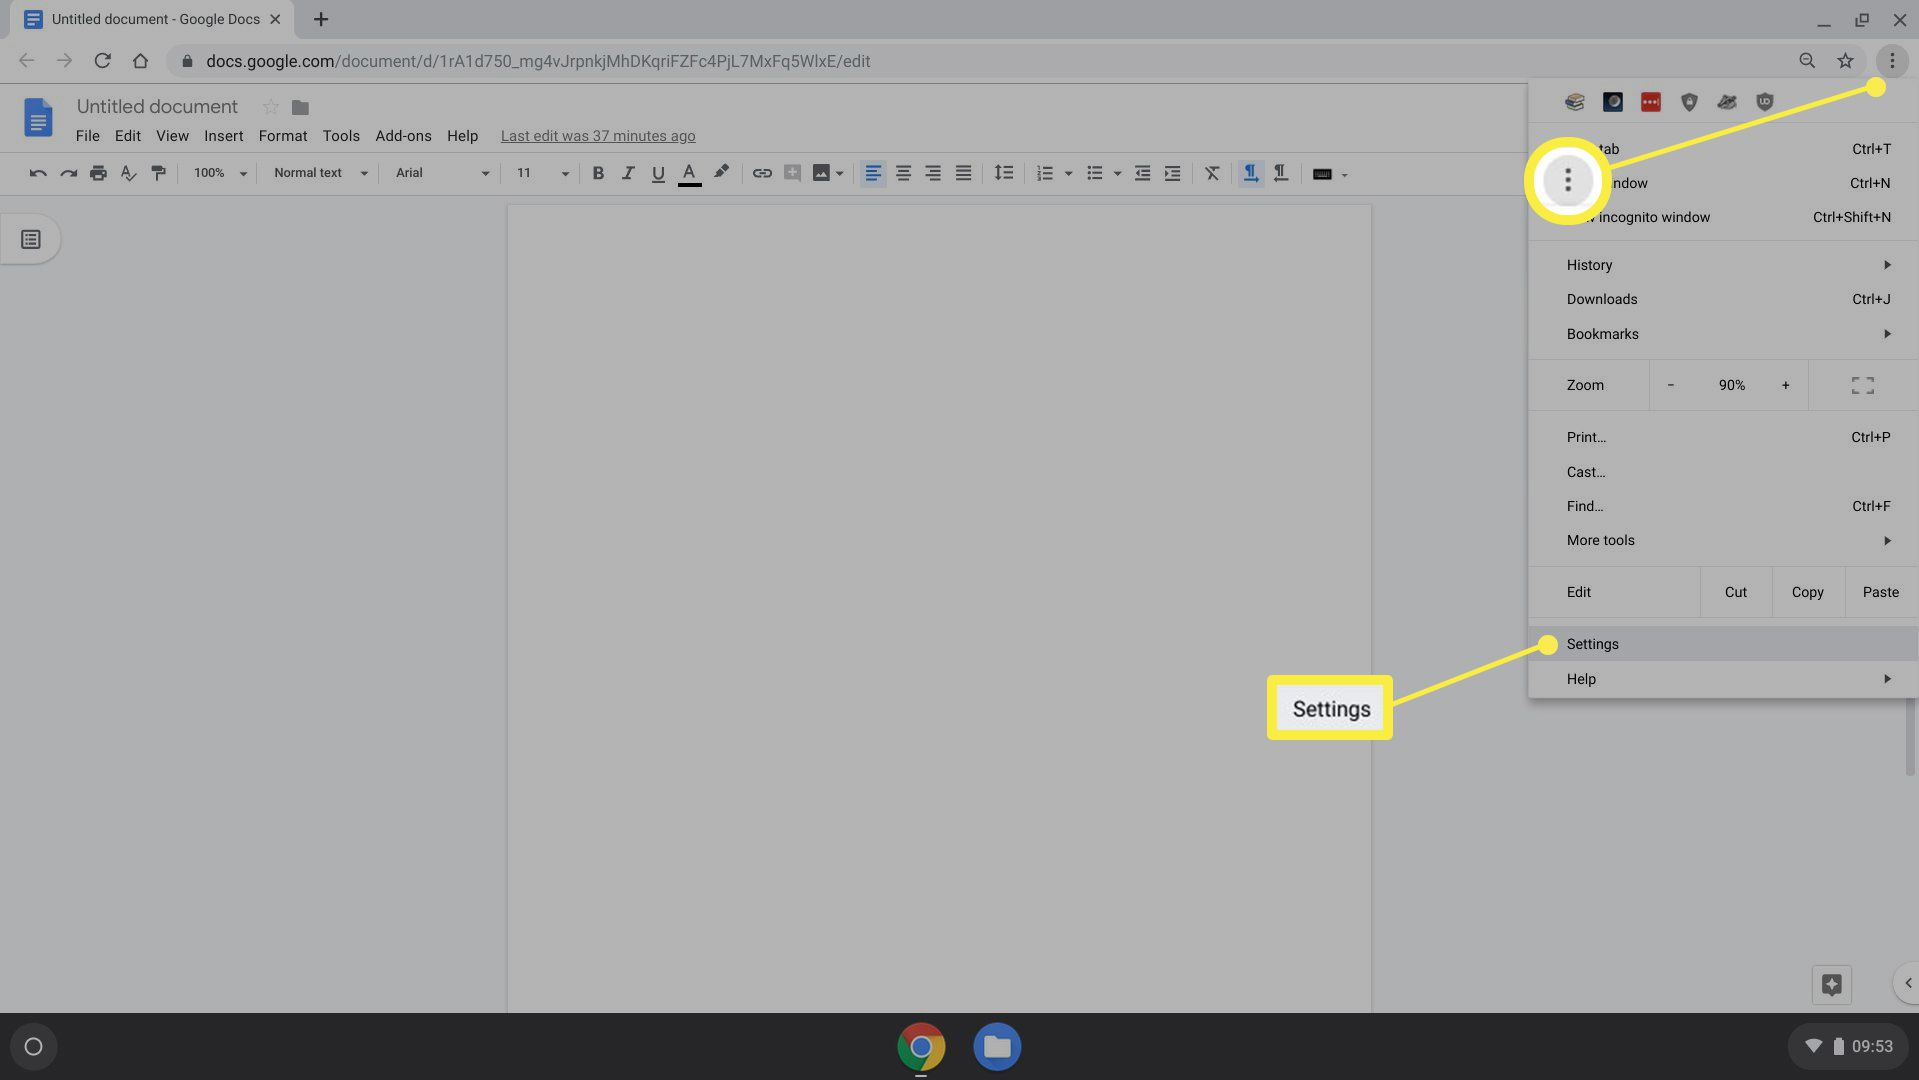 Chrome OS menu with Settings selected